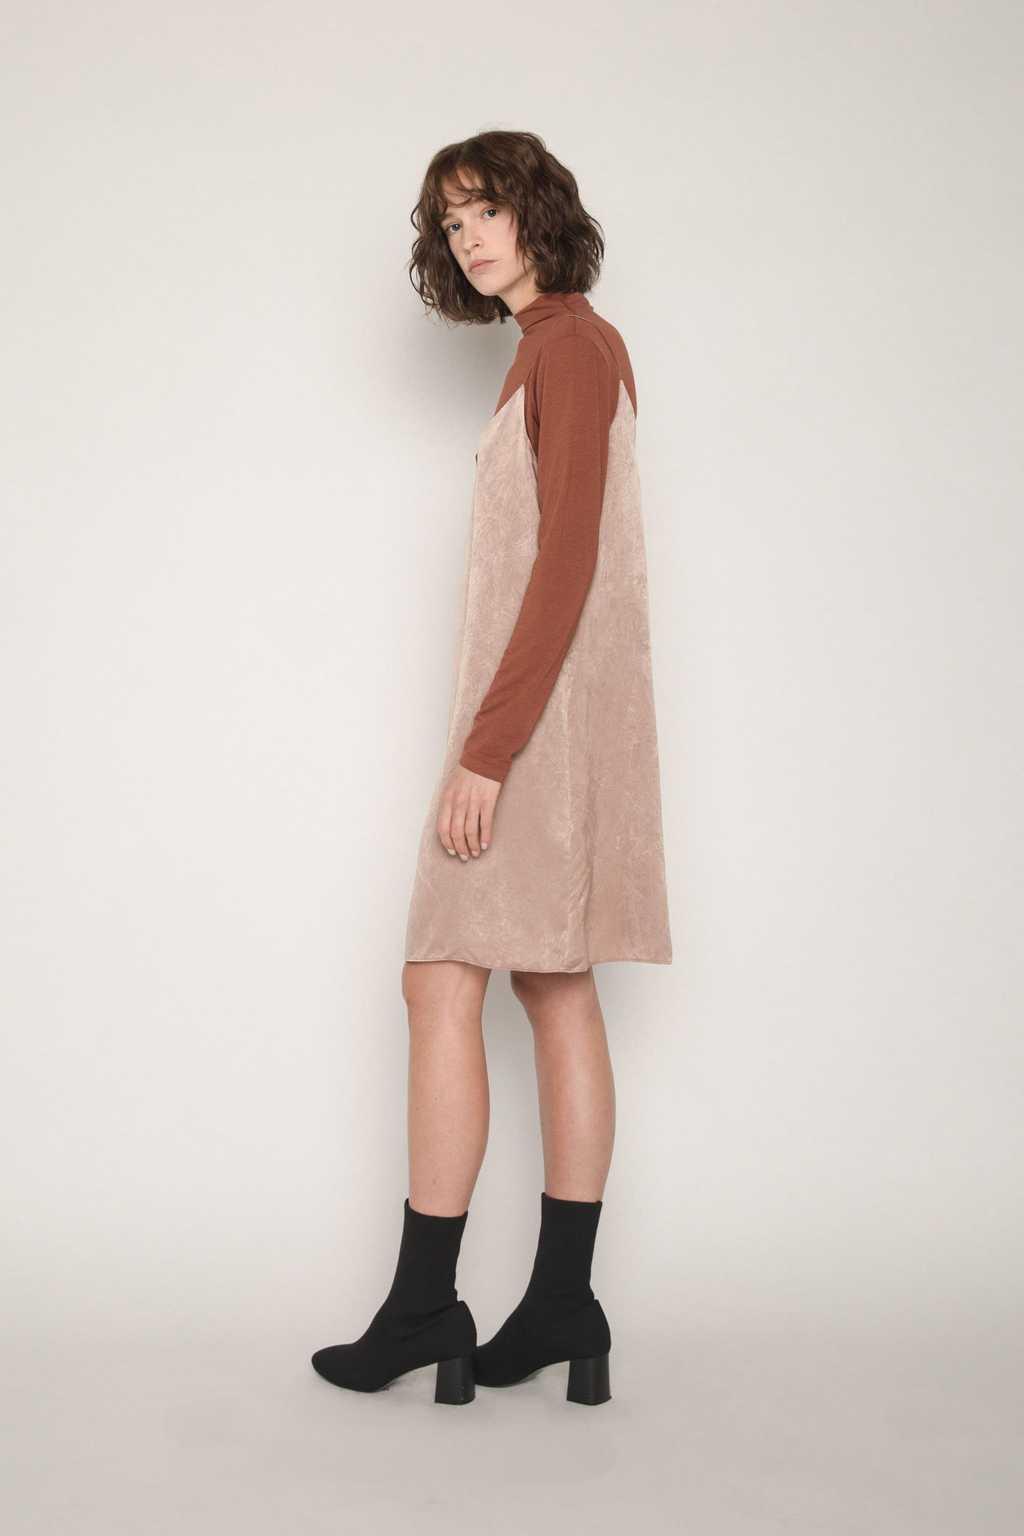 Dress H233 Beige 3